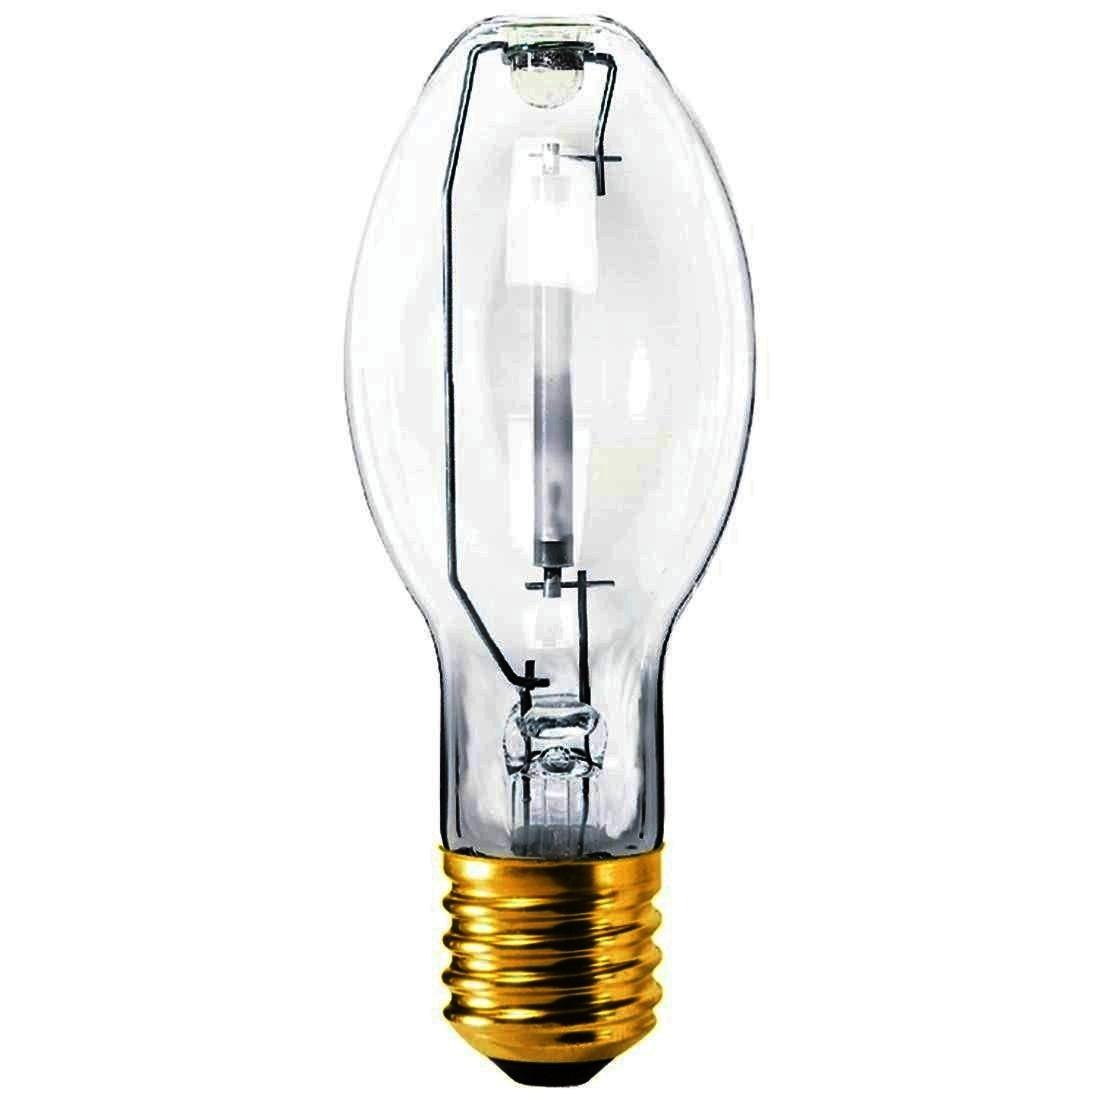 GE 85369 | LU100/H/ECO | ED23.5 HPS Bulb for High Pressure Sodium Lamp Fixtures  157uhy